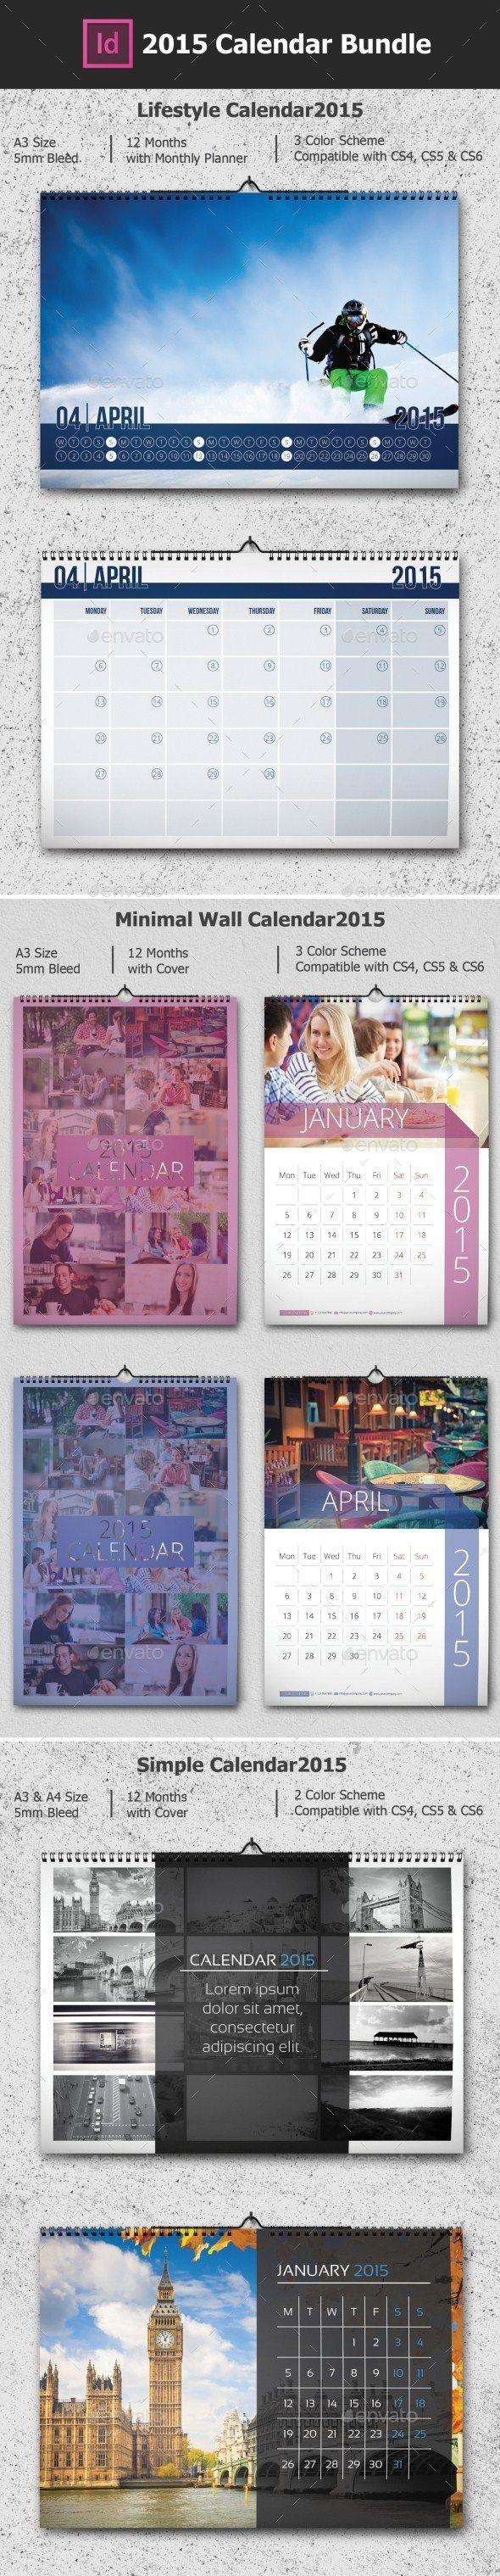 2015 Calendar Bundle Template | Buy and Download: http://graphicriver.net/item/2015-calendar-bundle/9678425?ref=ksioks